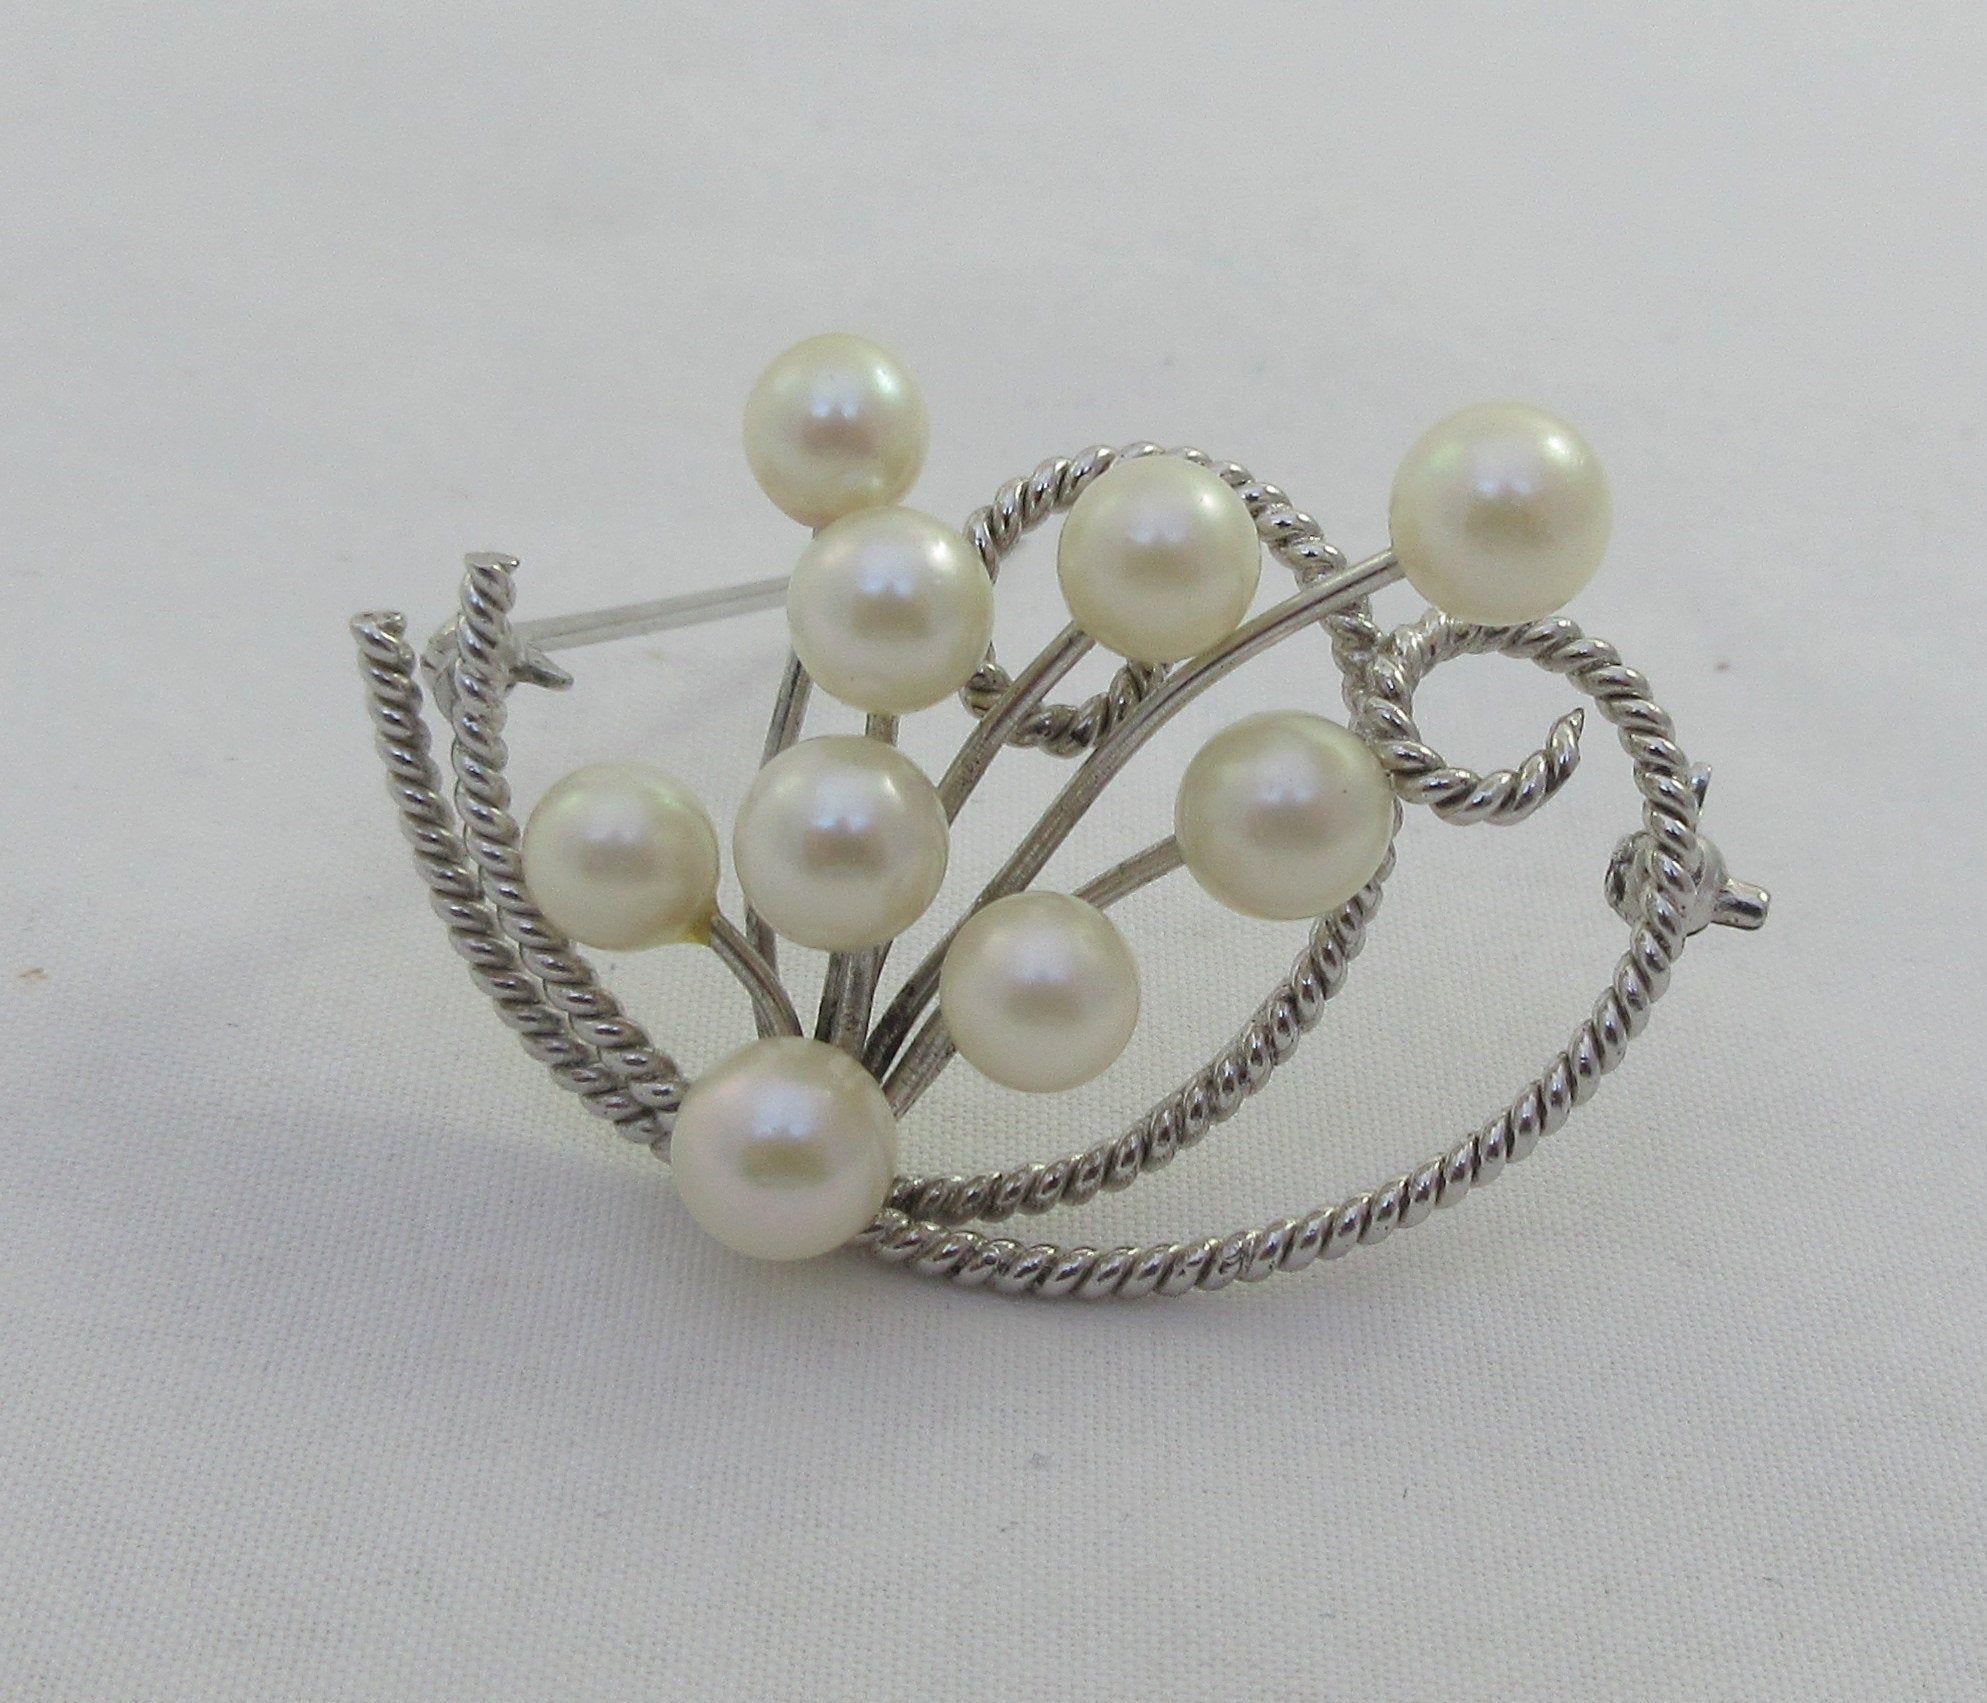 10k Solid Gold Open Heart Pearl Brooch Modernist Pin